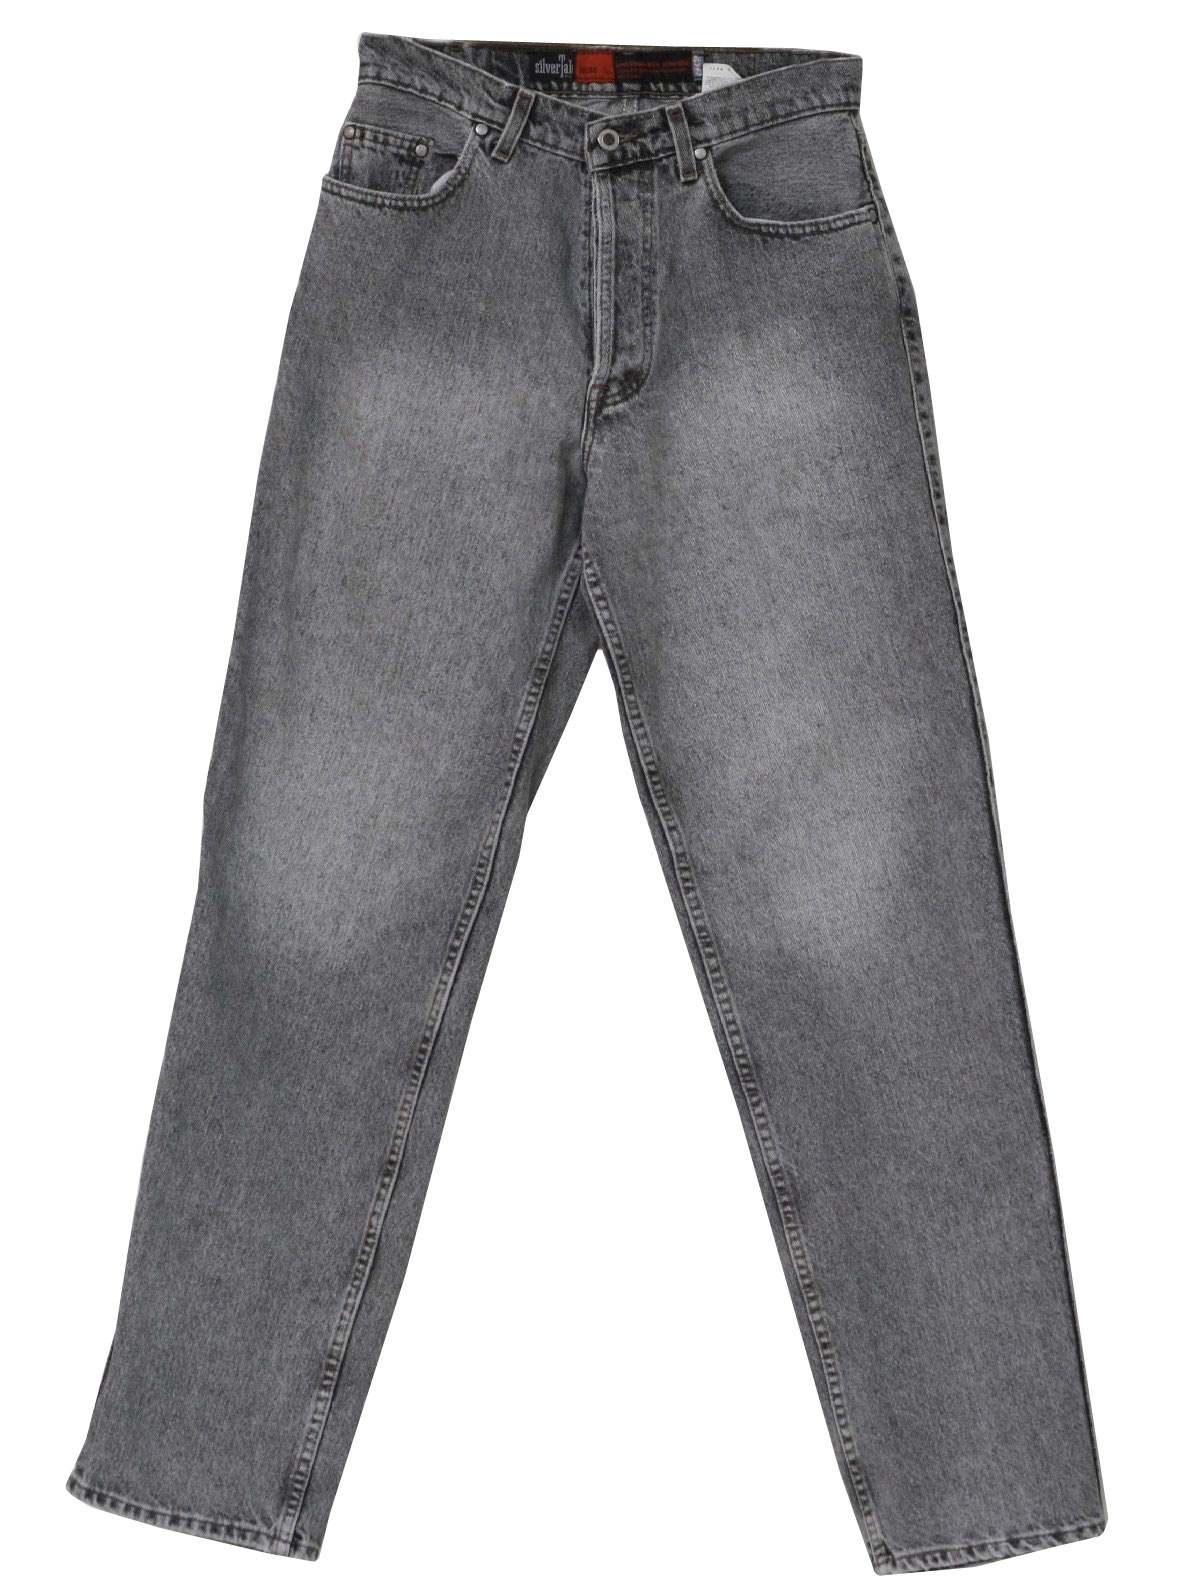 Retro 80s Pants (Levis Silvertab) : 90s -Levis Silvertab- Mens ...